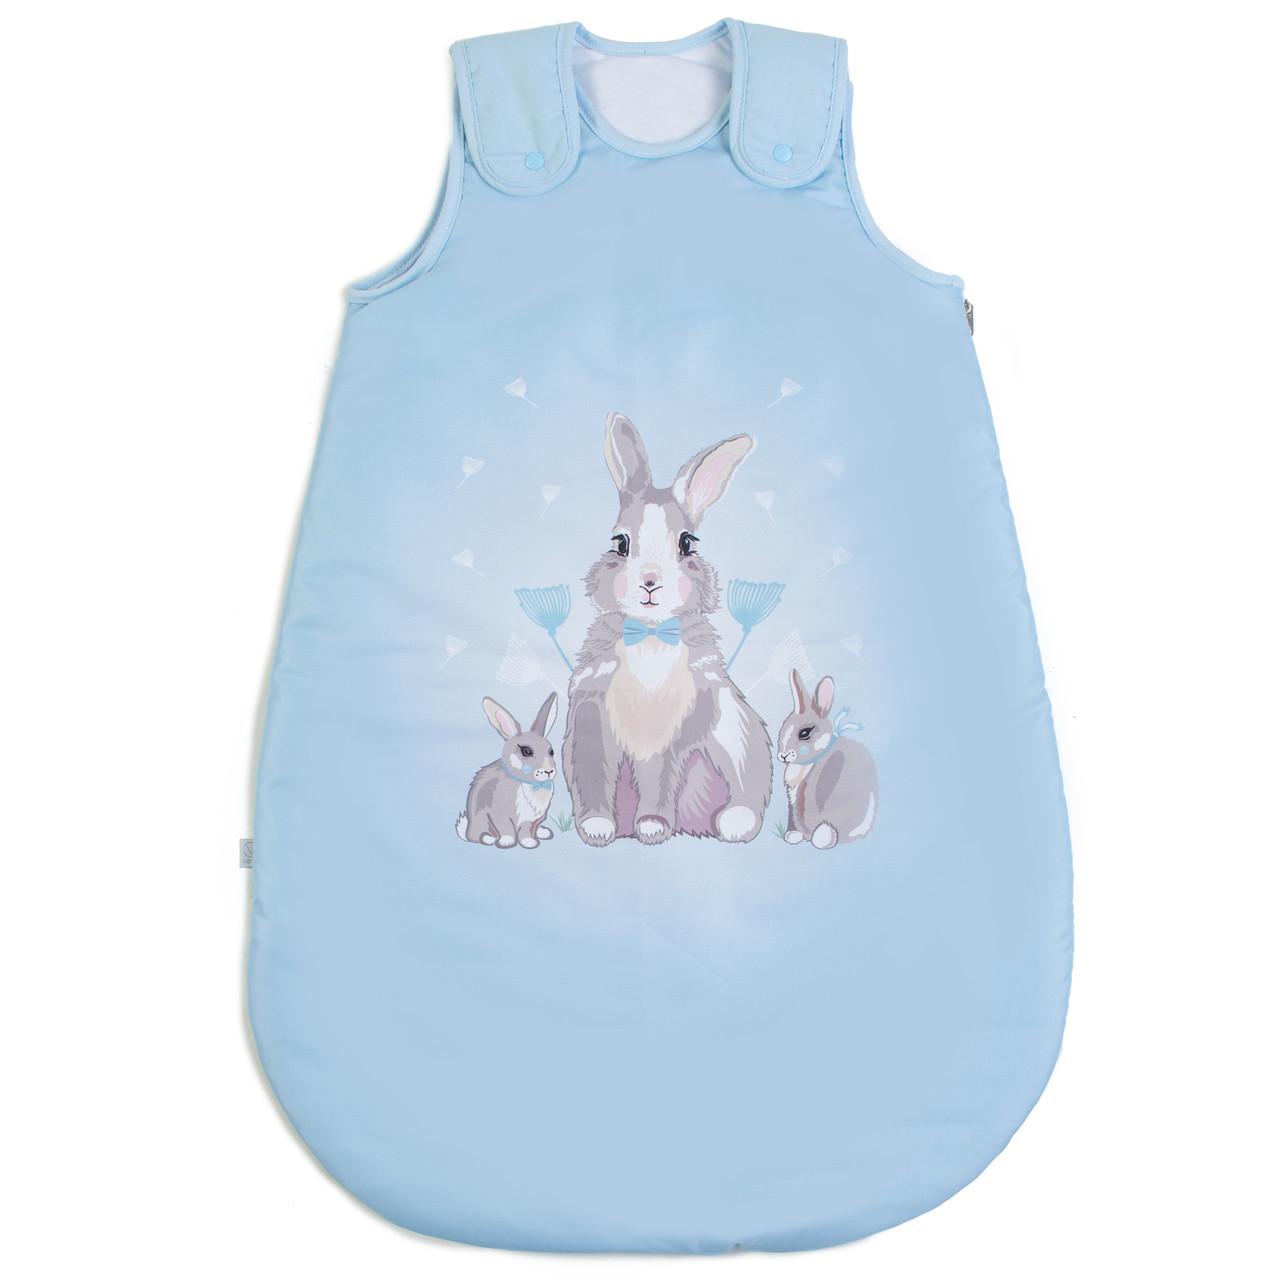 Cпальник Veres Summer Bunny blue (0-12 месяцев)